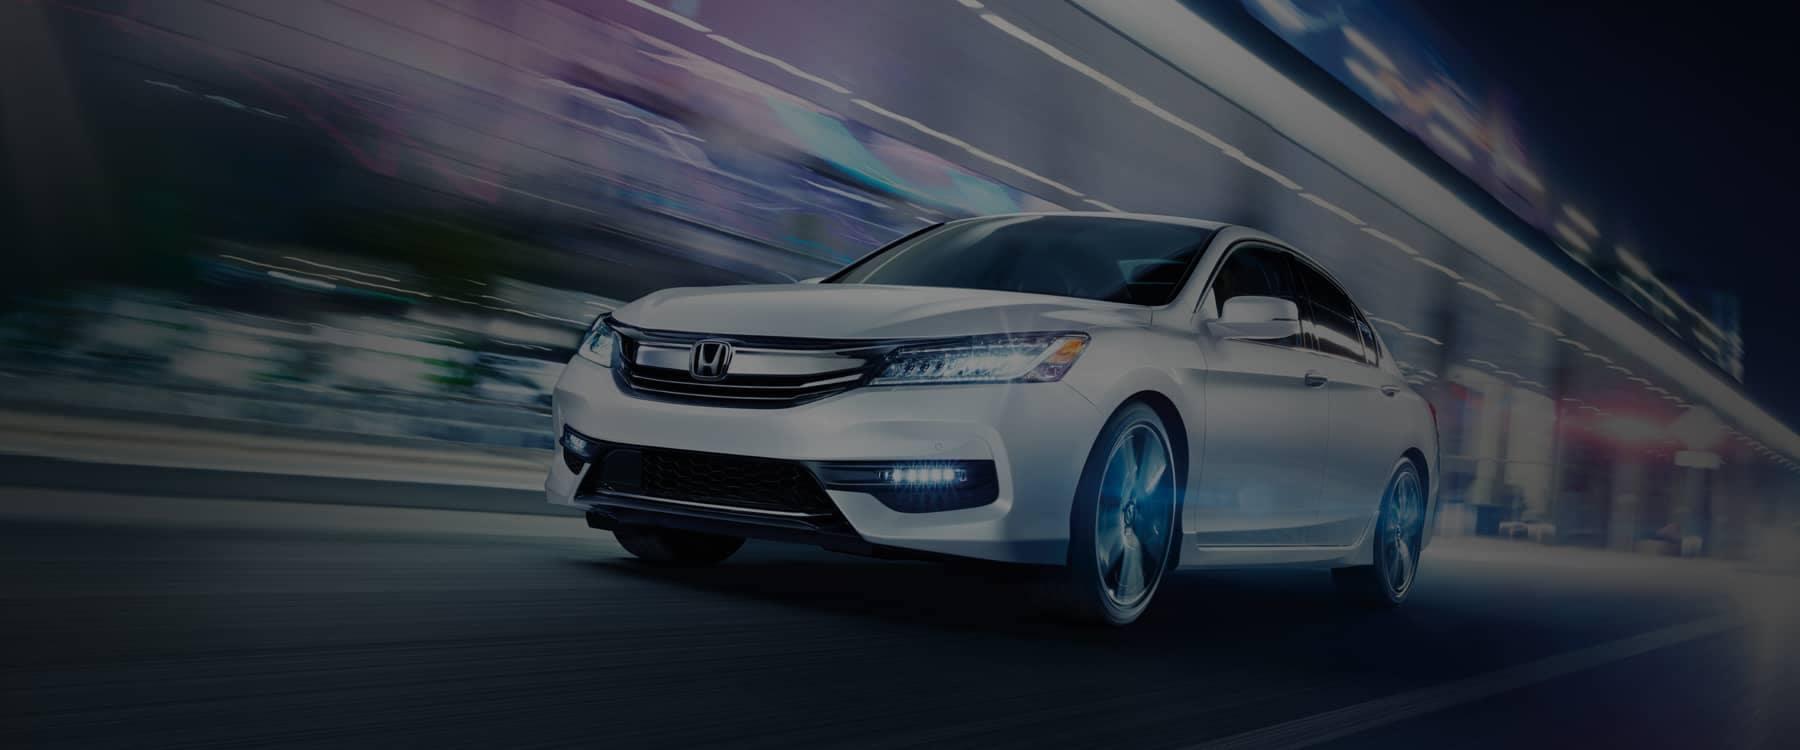 The New Babylon Honda | New and Used Honda Dealership With